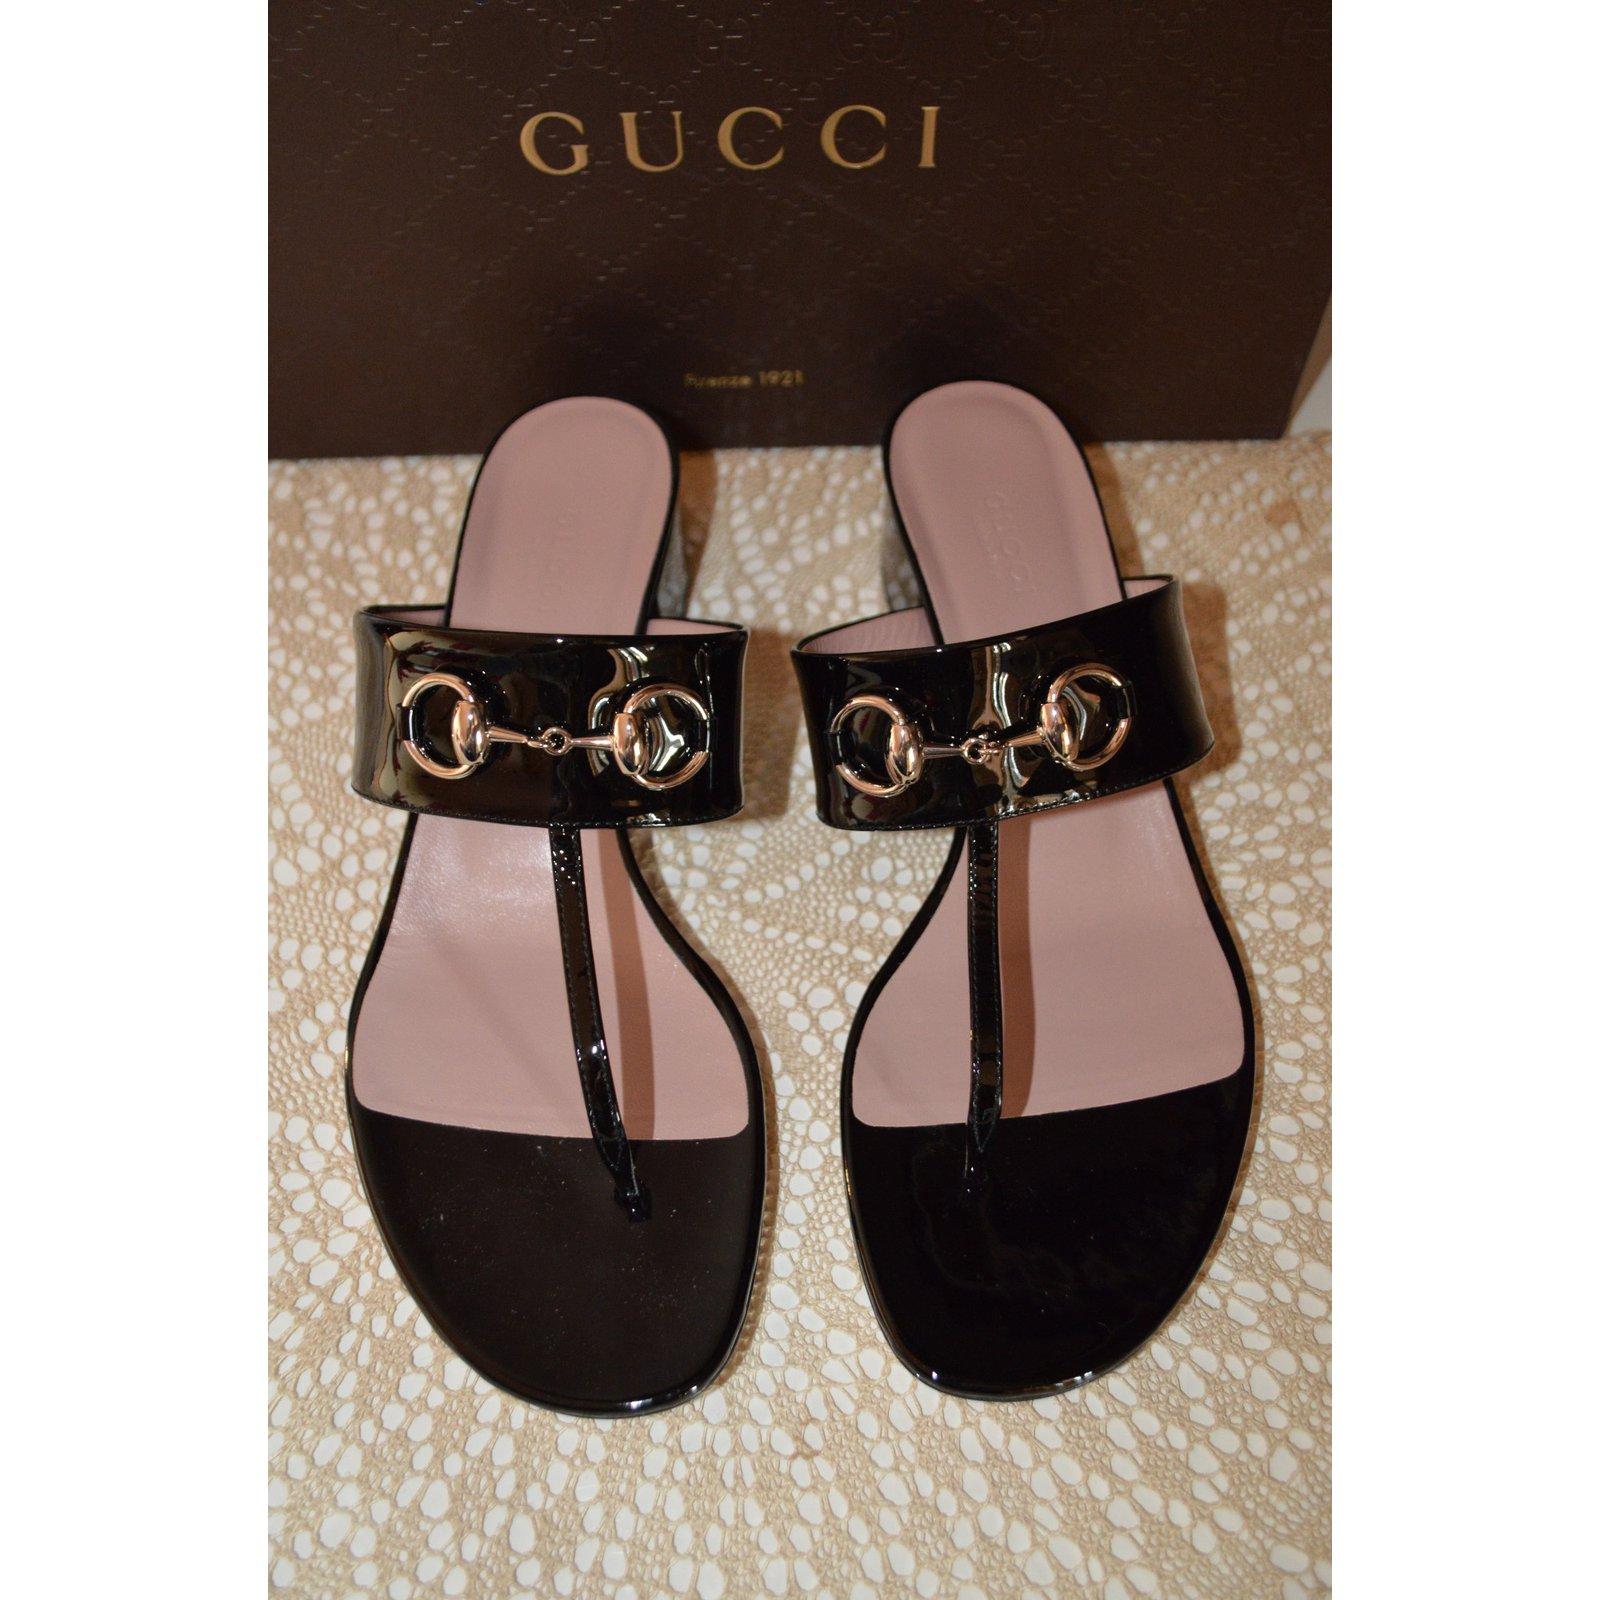 eb8c06379 Gucci GUCCI FLIP FLOP 4HEEL SIZE 38